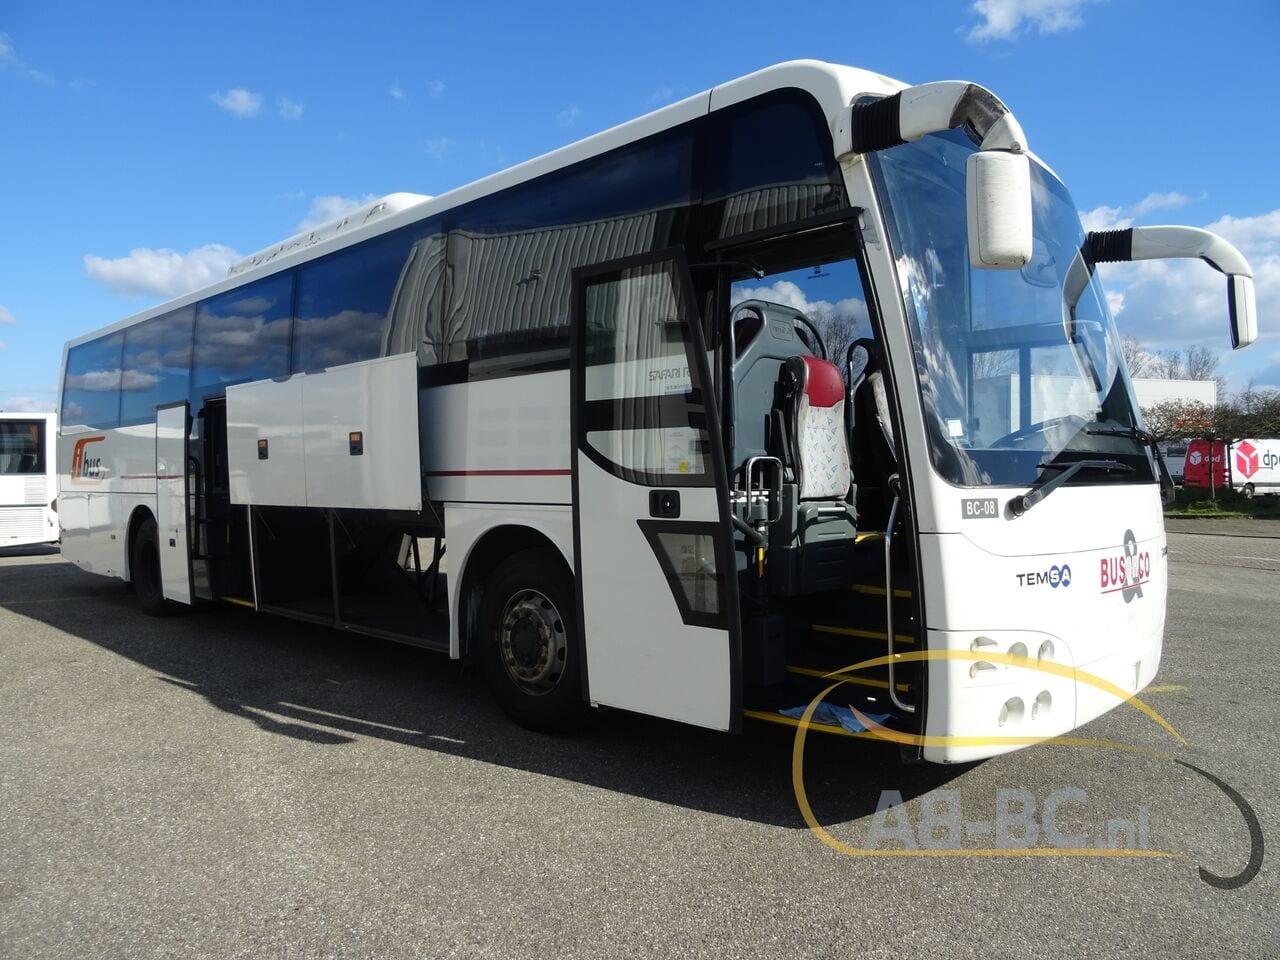 coach-busTEMSA-Safari-RD-53-Seats-DAF-Motor-12-mtr---1616164192659759230_big_2c468b702463651af2c78d6471be3efc--21031916283496651600